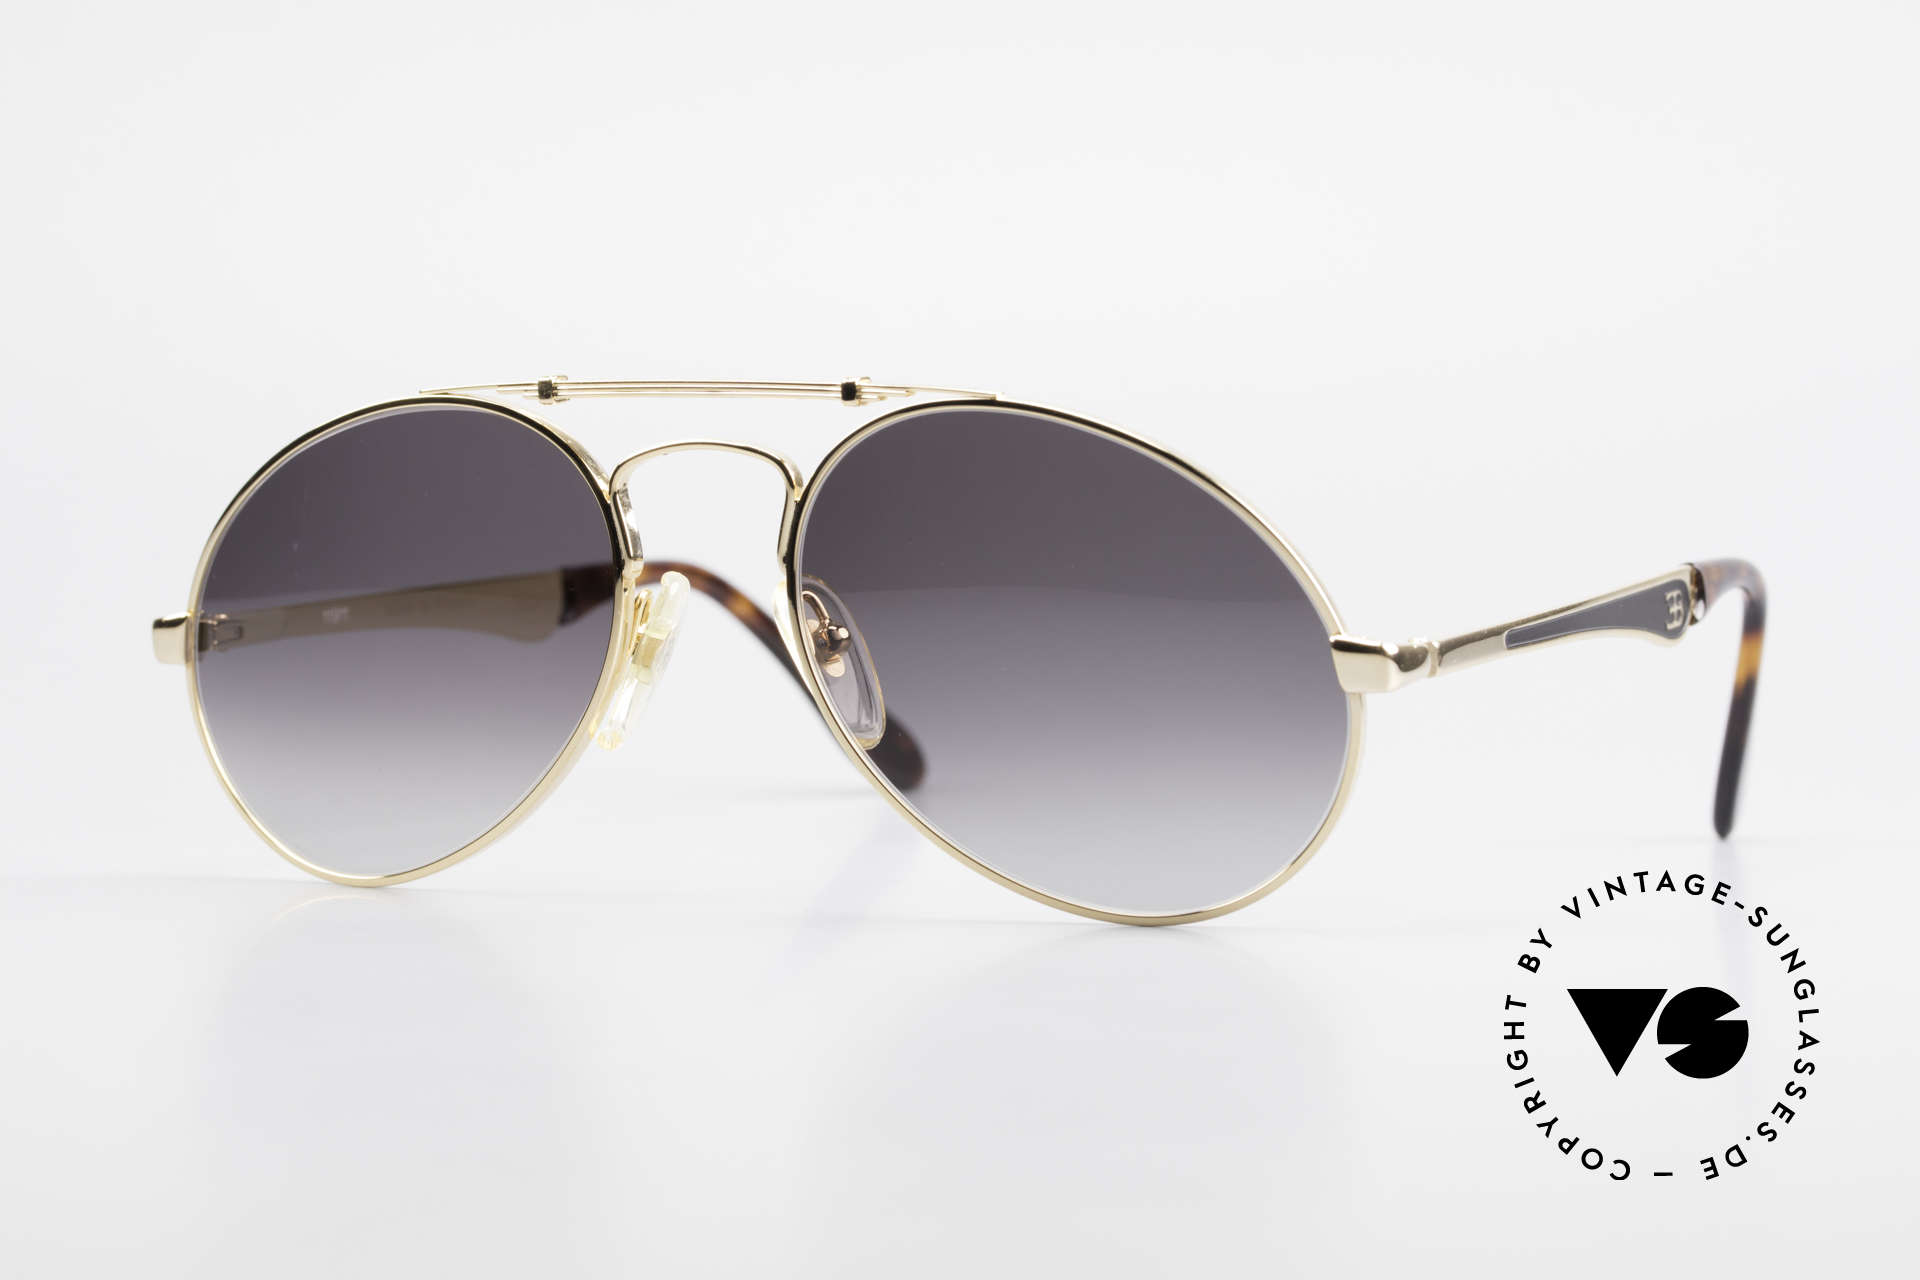 Bugatti 11911 80's Luxury Men's Sunglasses, vintage 80's men's sunglasses, large size 56/20, Made for Men